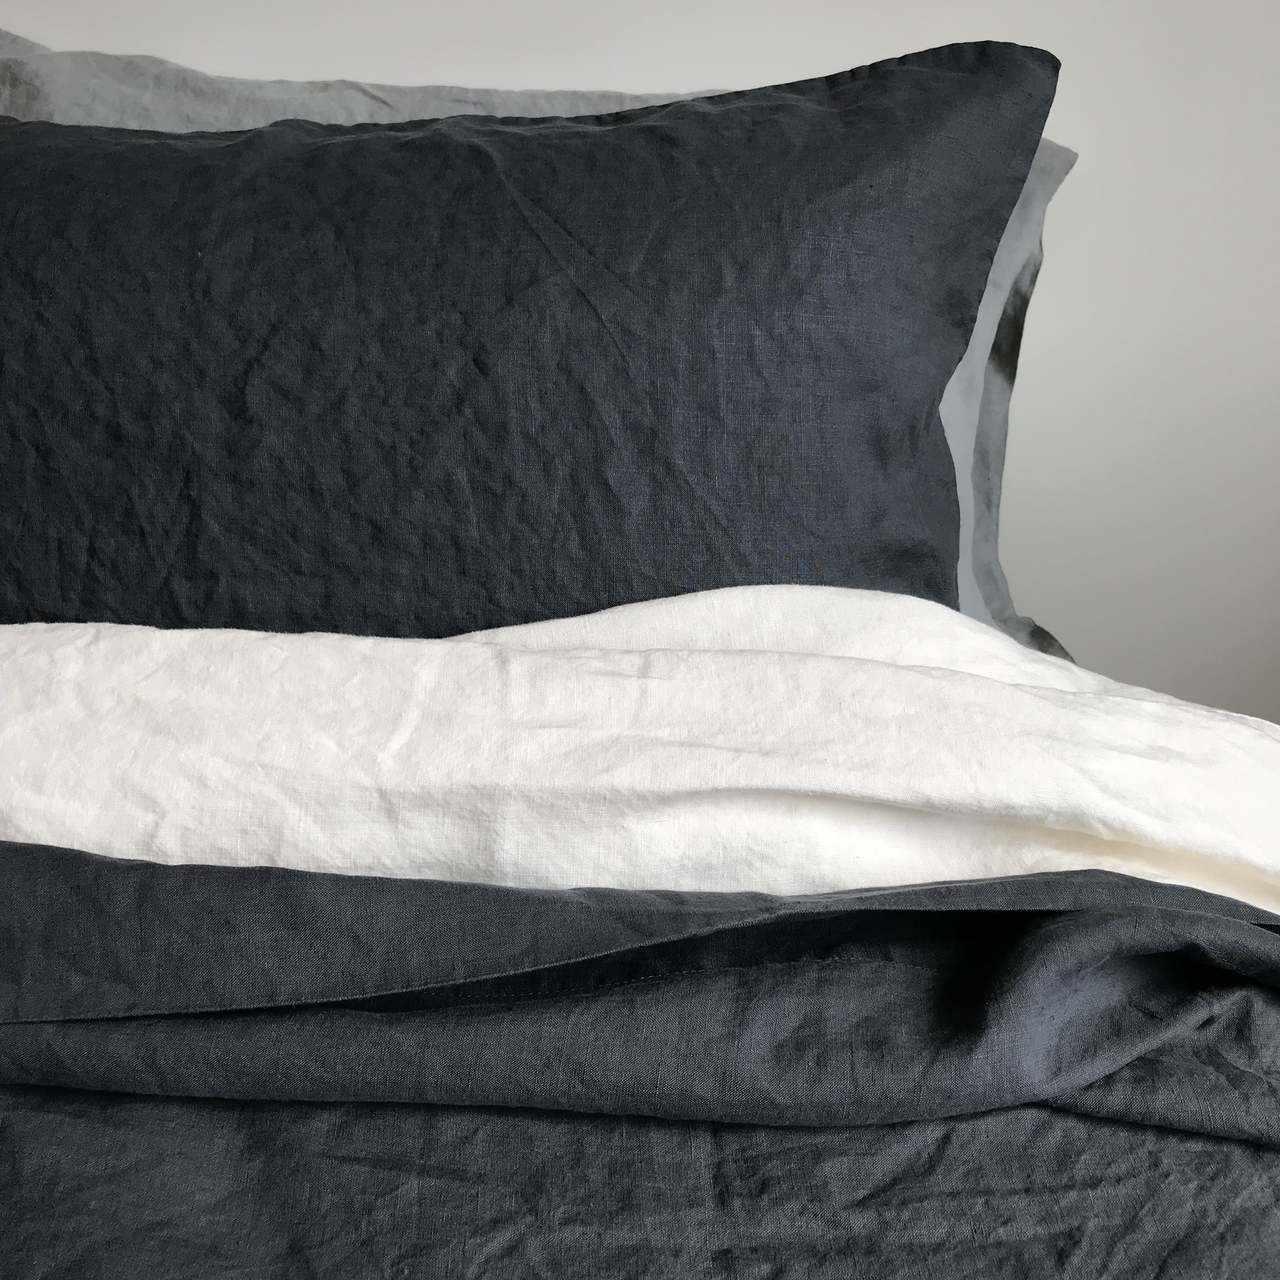 Linoto 100 Percent Linen Sheet Sets